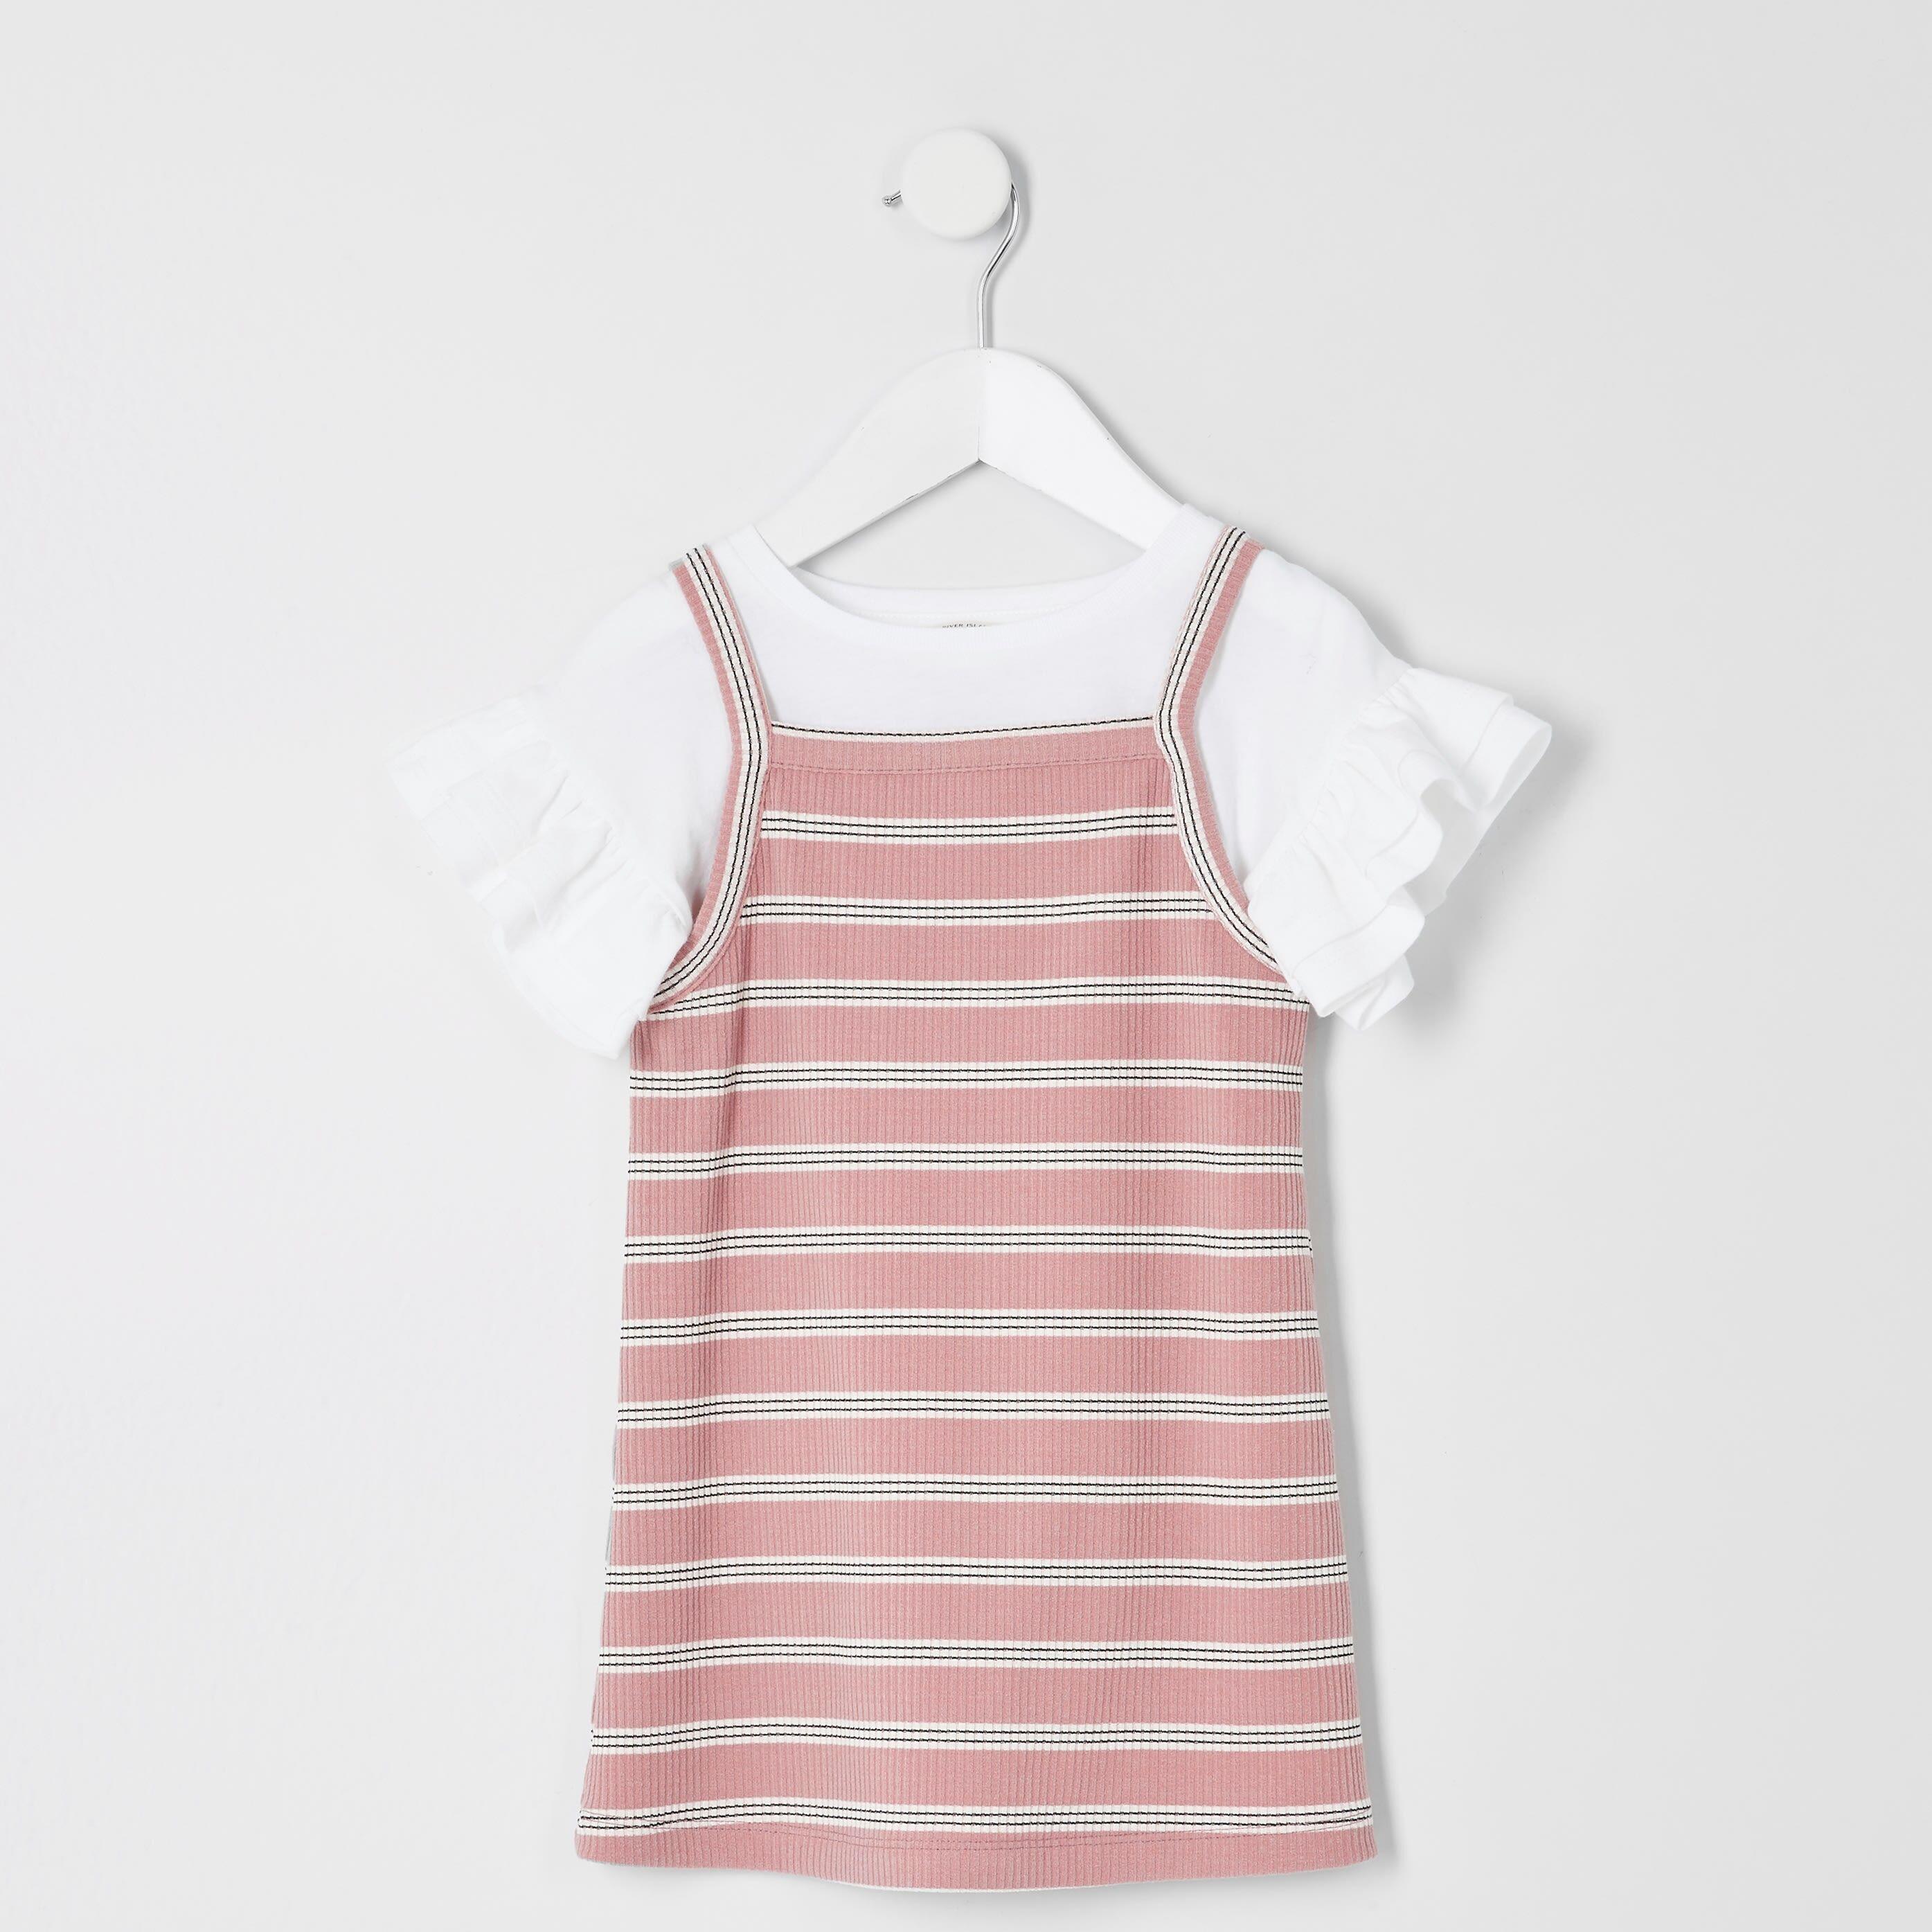 River Island Baby Girls 2 in 1 Pink stripe T-shirt dress (18-24 Mths)